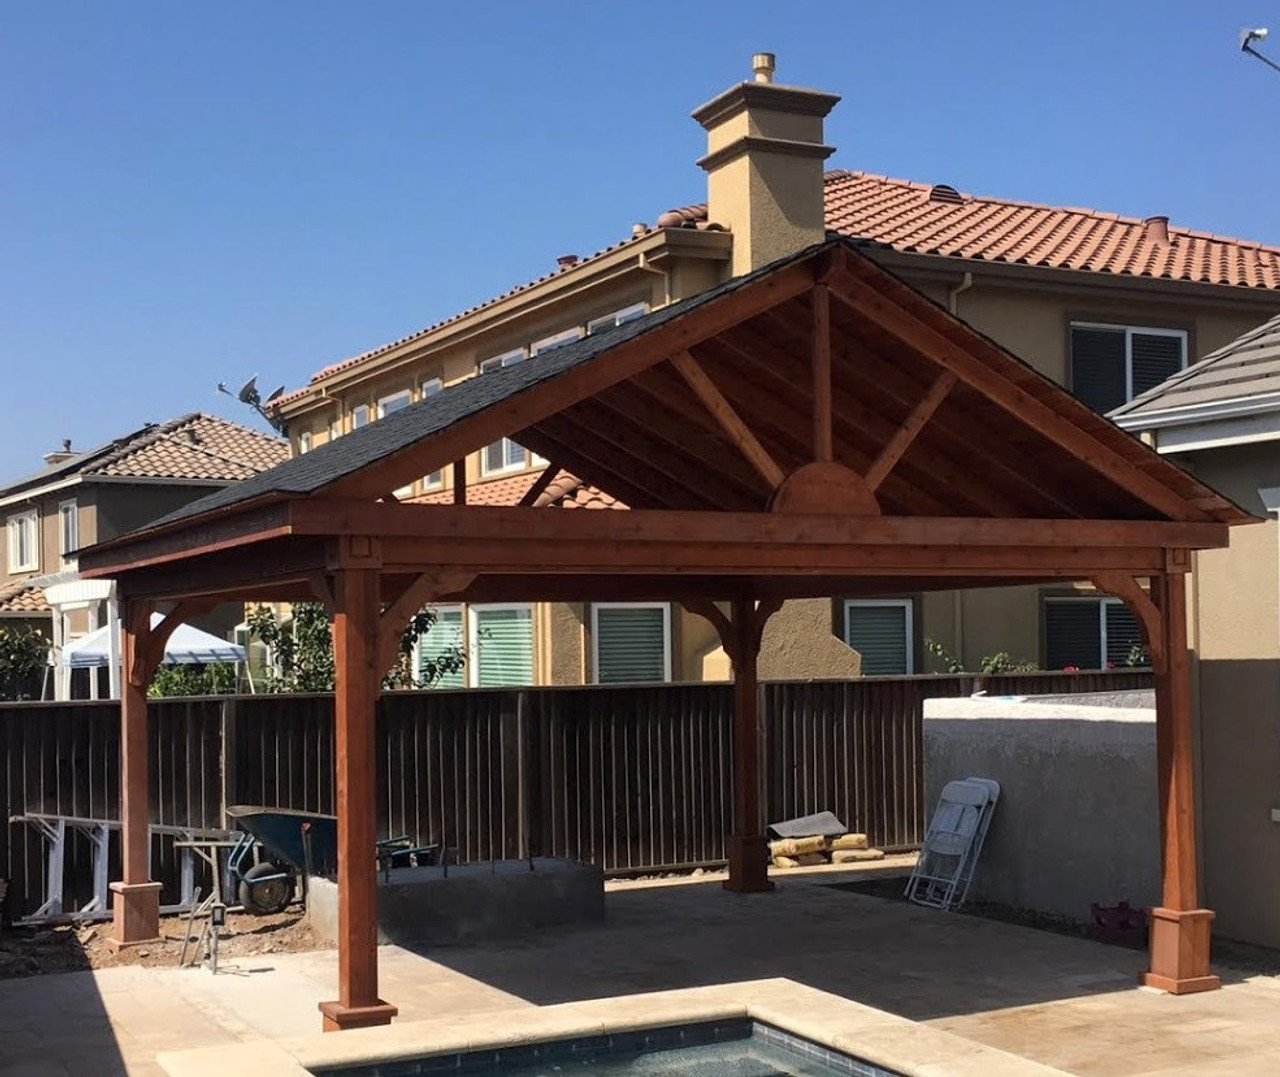 16x16 Gabled Roof Cedar Pavilion Kit, San Jose, California